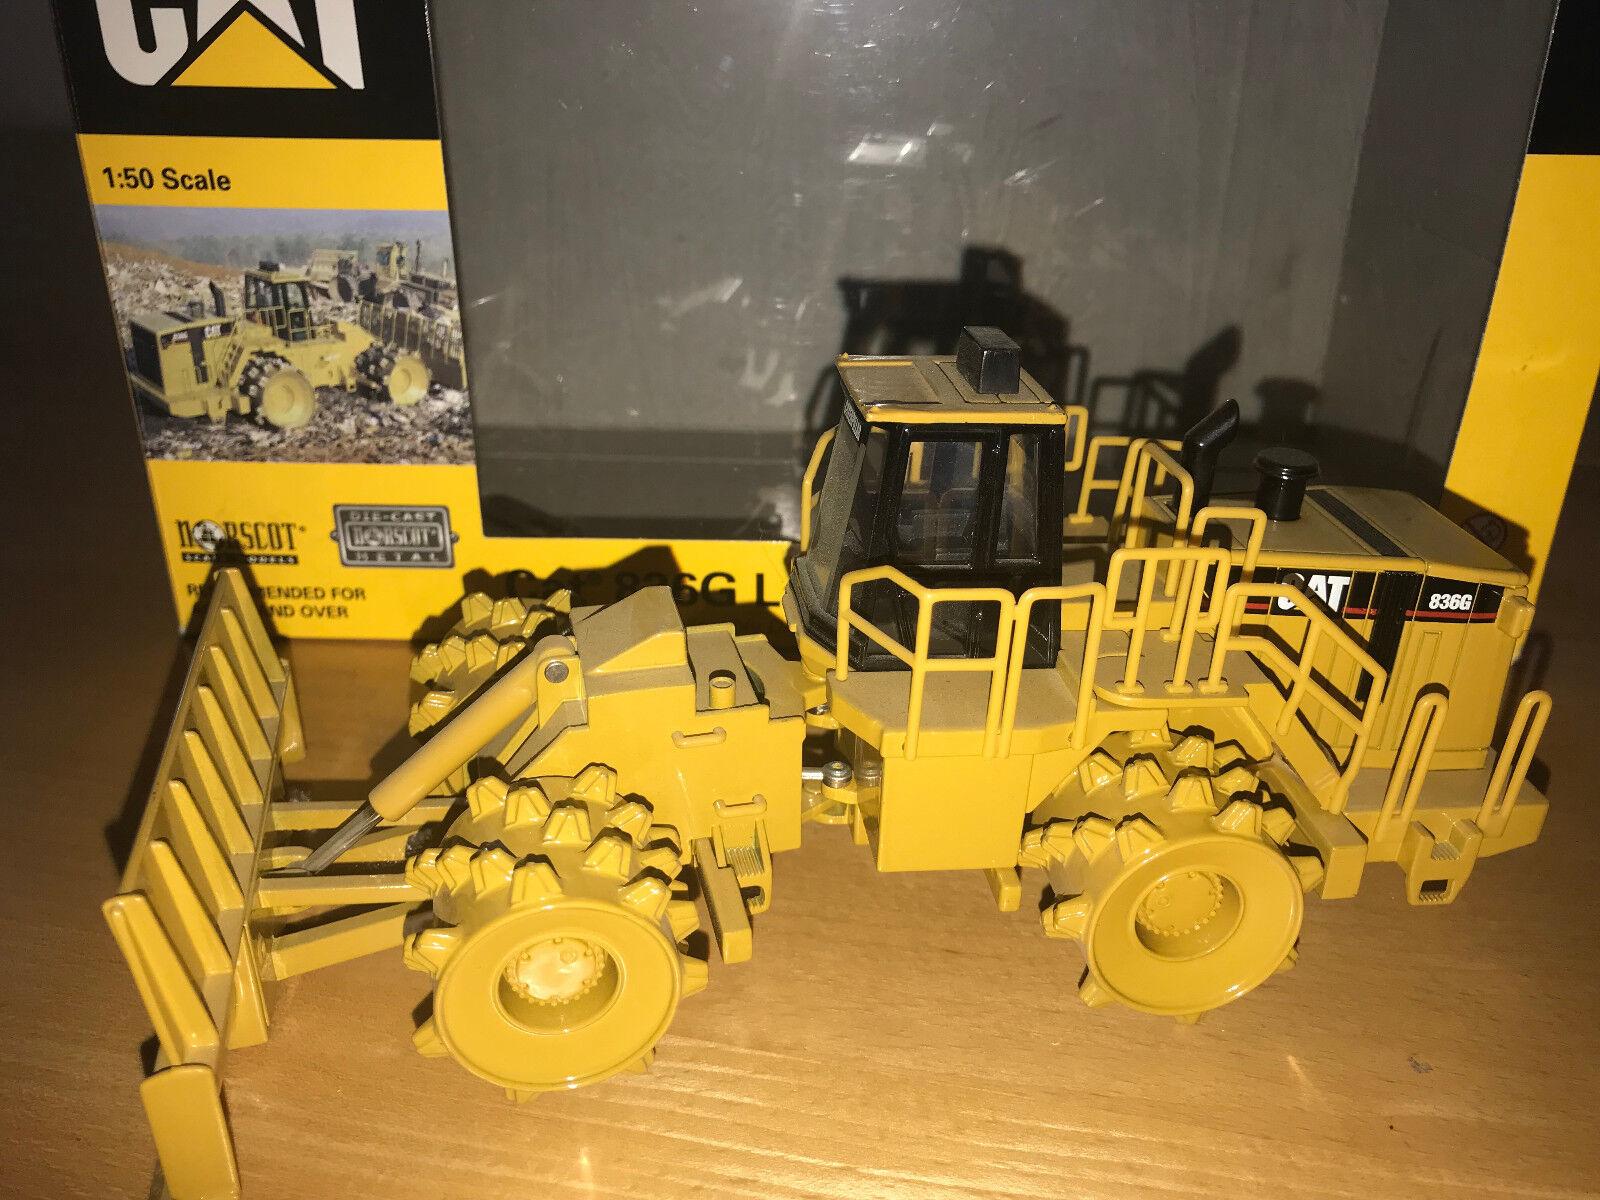 Caterpillar CAT 836G landfill compactor in neuem gelb in OVP v. Norscot  | Schönes Aussehen